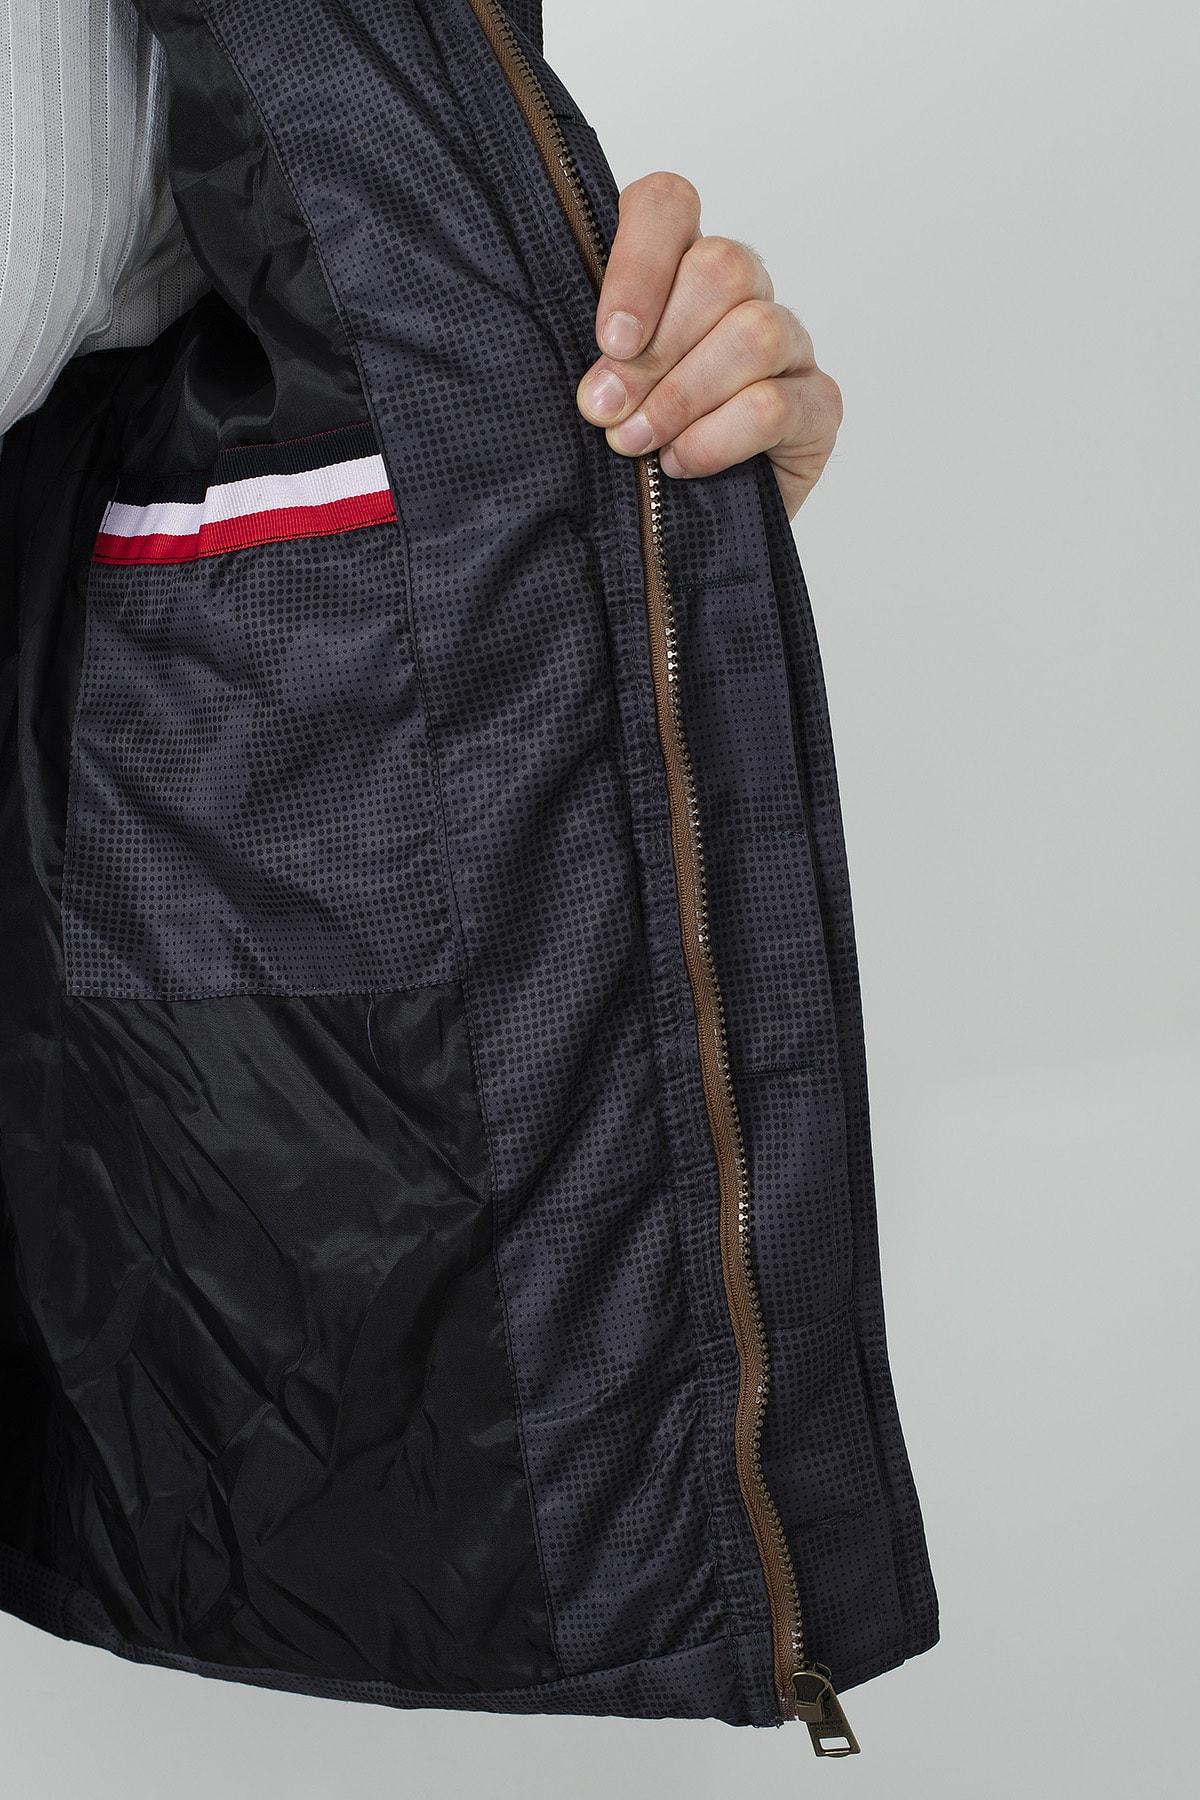 Buratti Erkek Kahverengi Slim Fit Kapüşonlu Dik Yaka Şişme Mont 4